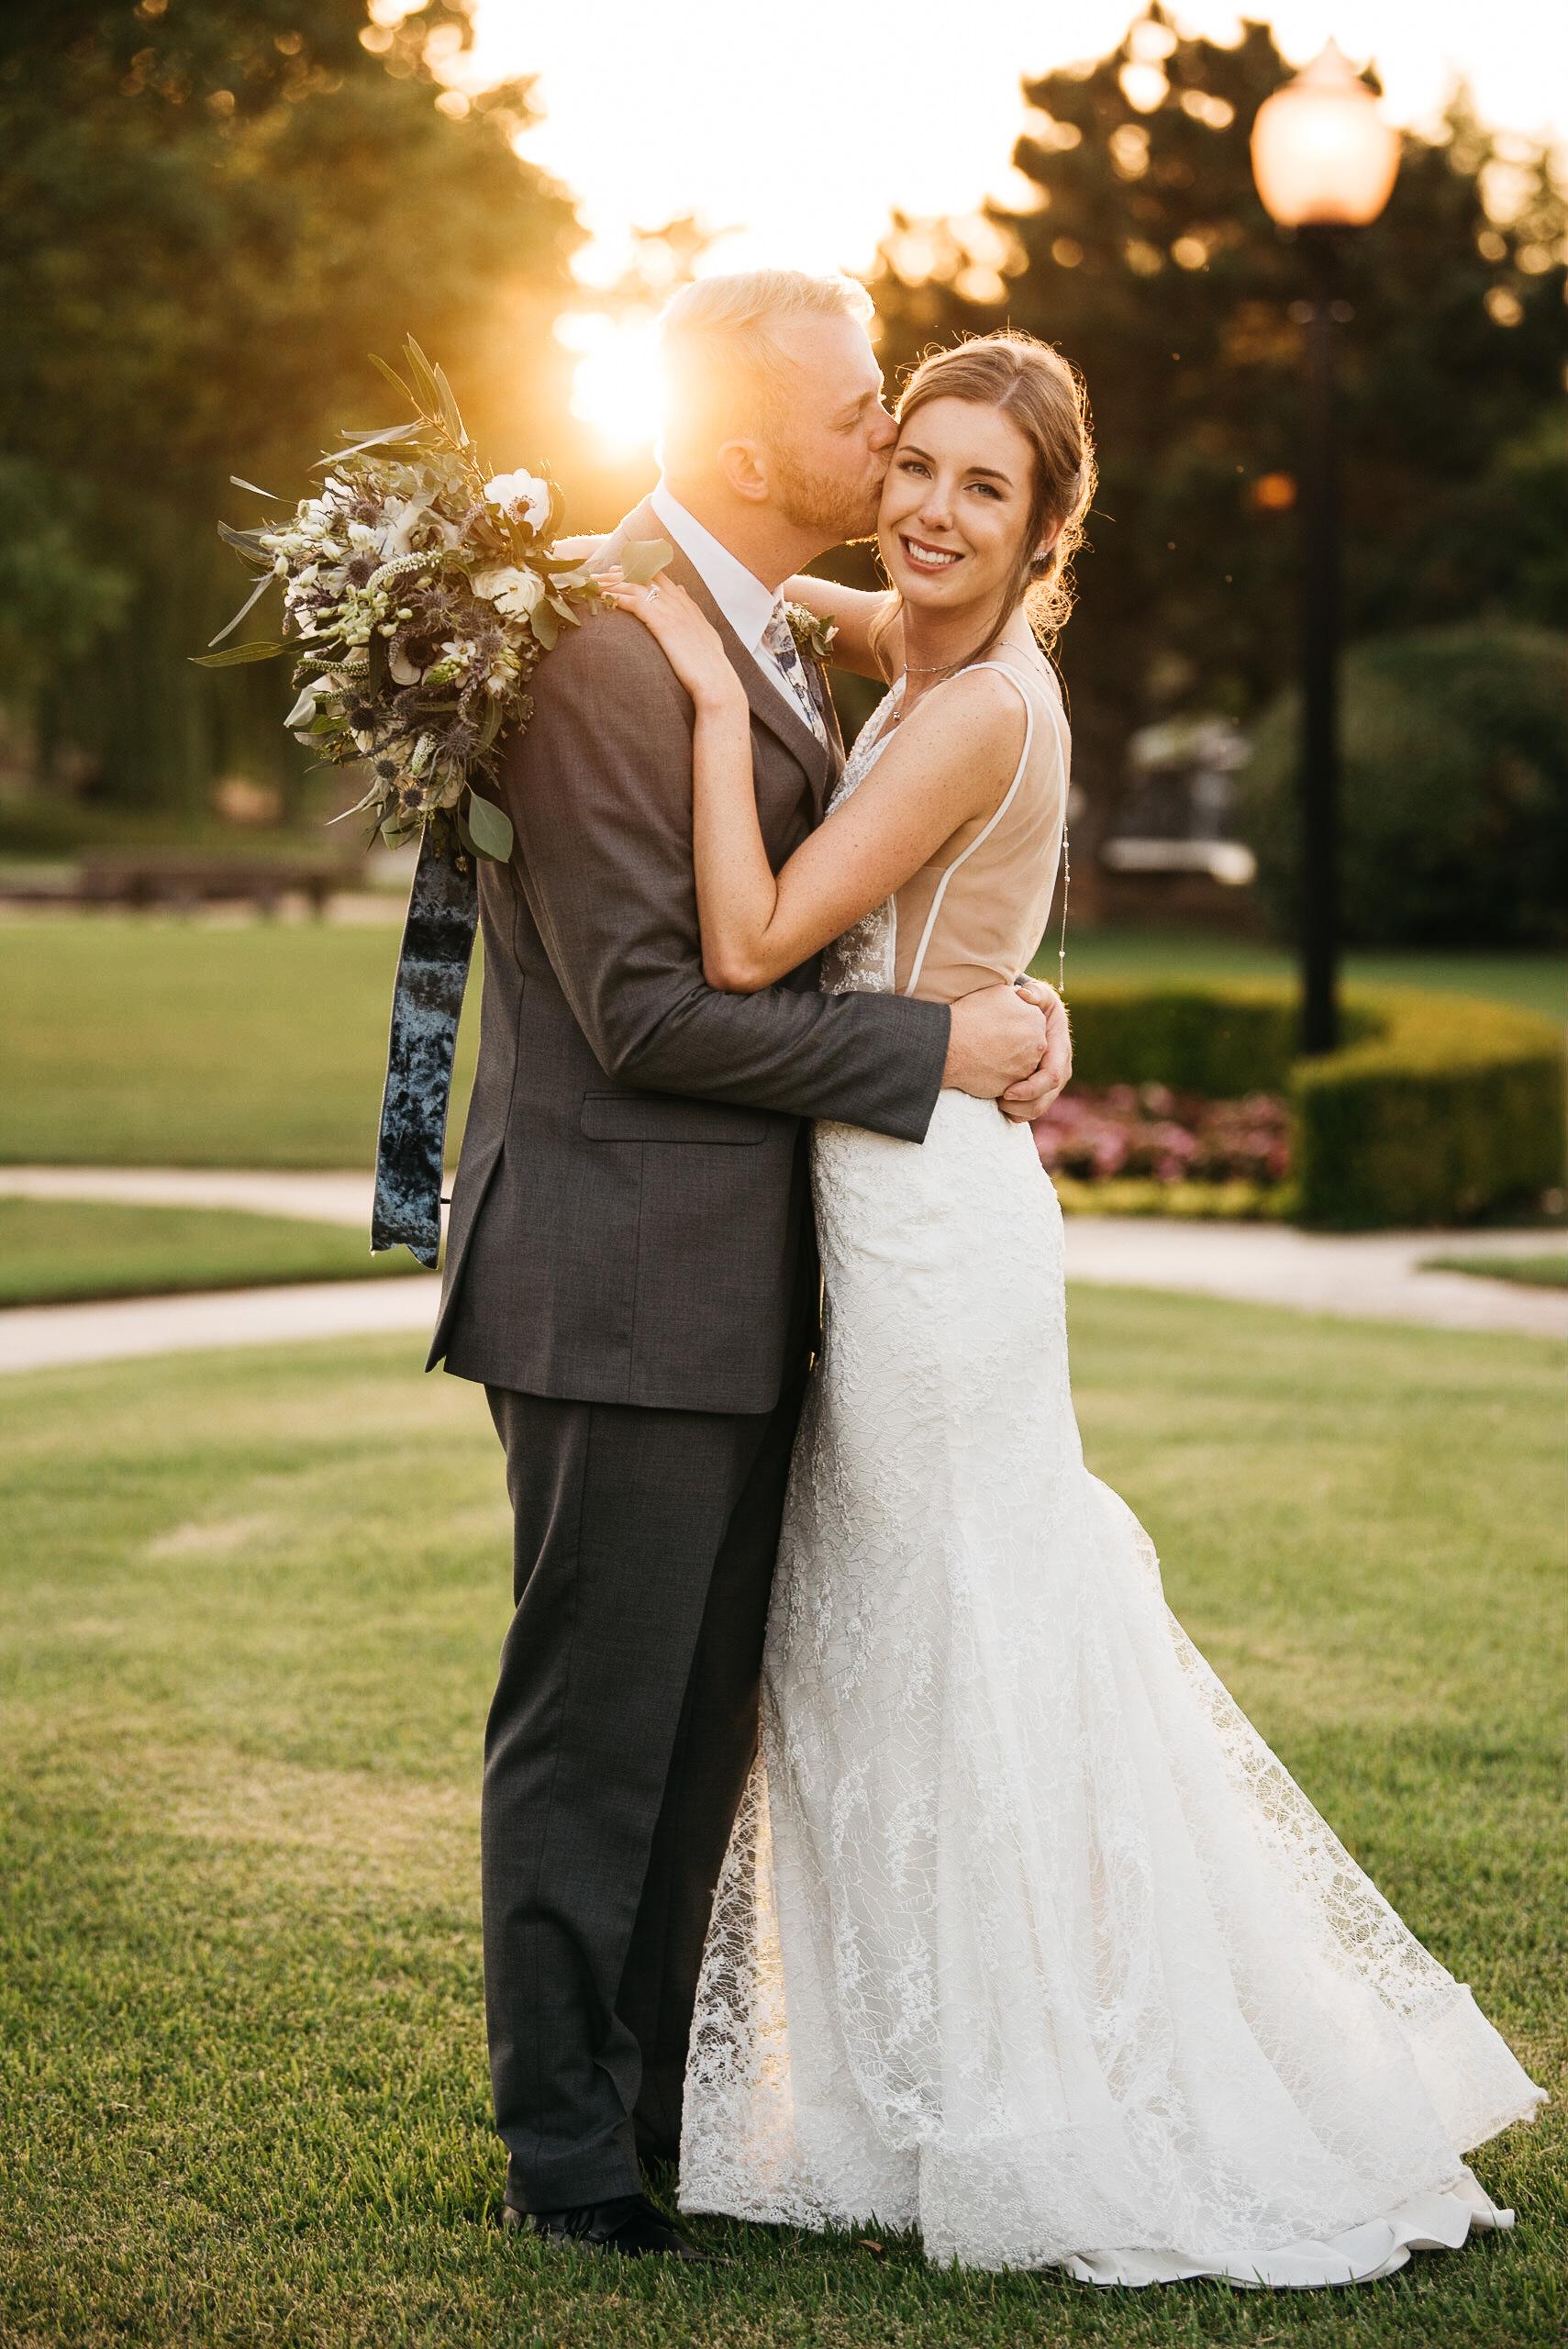 okc-wedding-photographer-coles-garden-wedding-okc-best-wedding-photographers-140.jpg